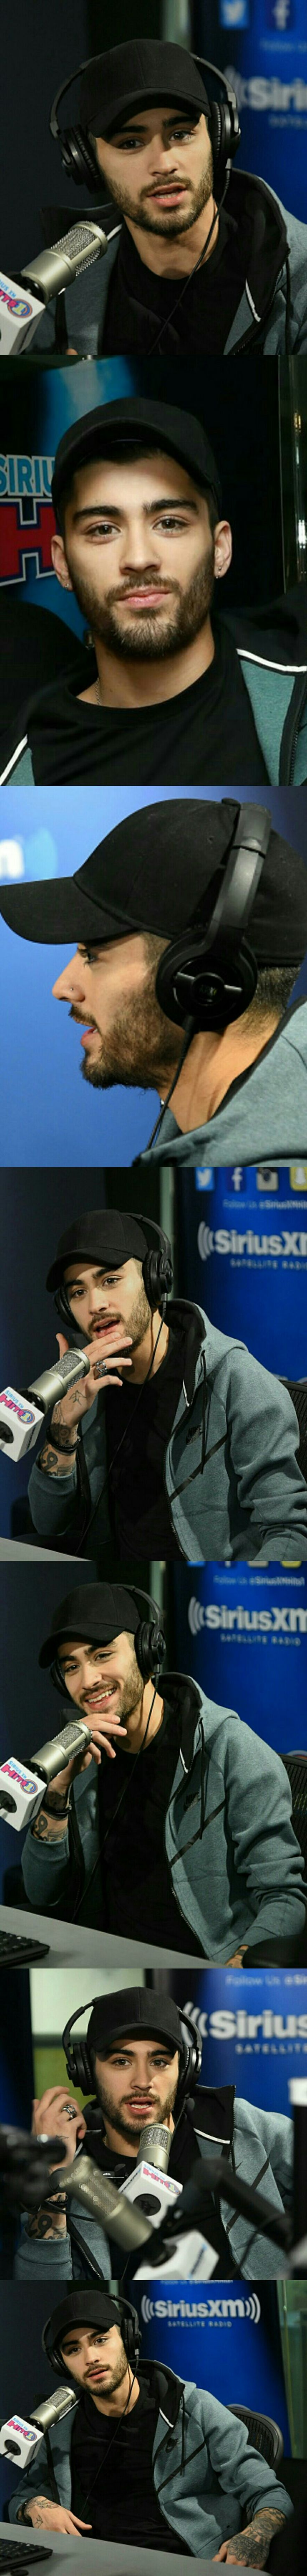 Zayn Malik ❥ at a radio station for an interview  #Zayn Malik